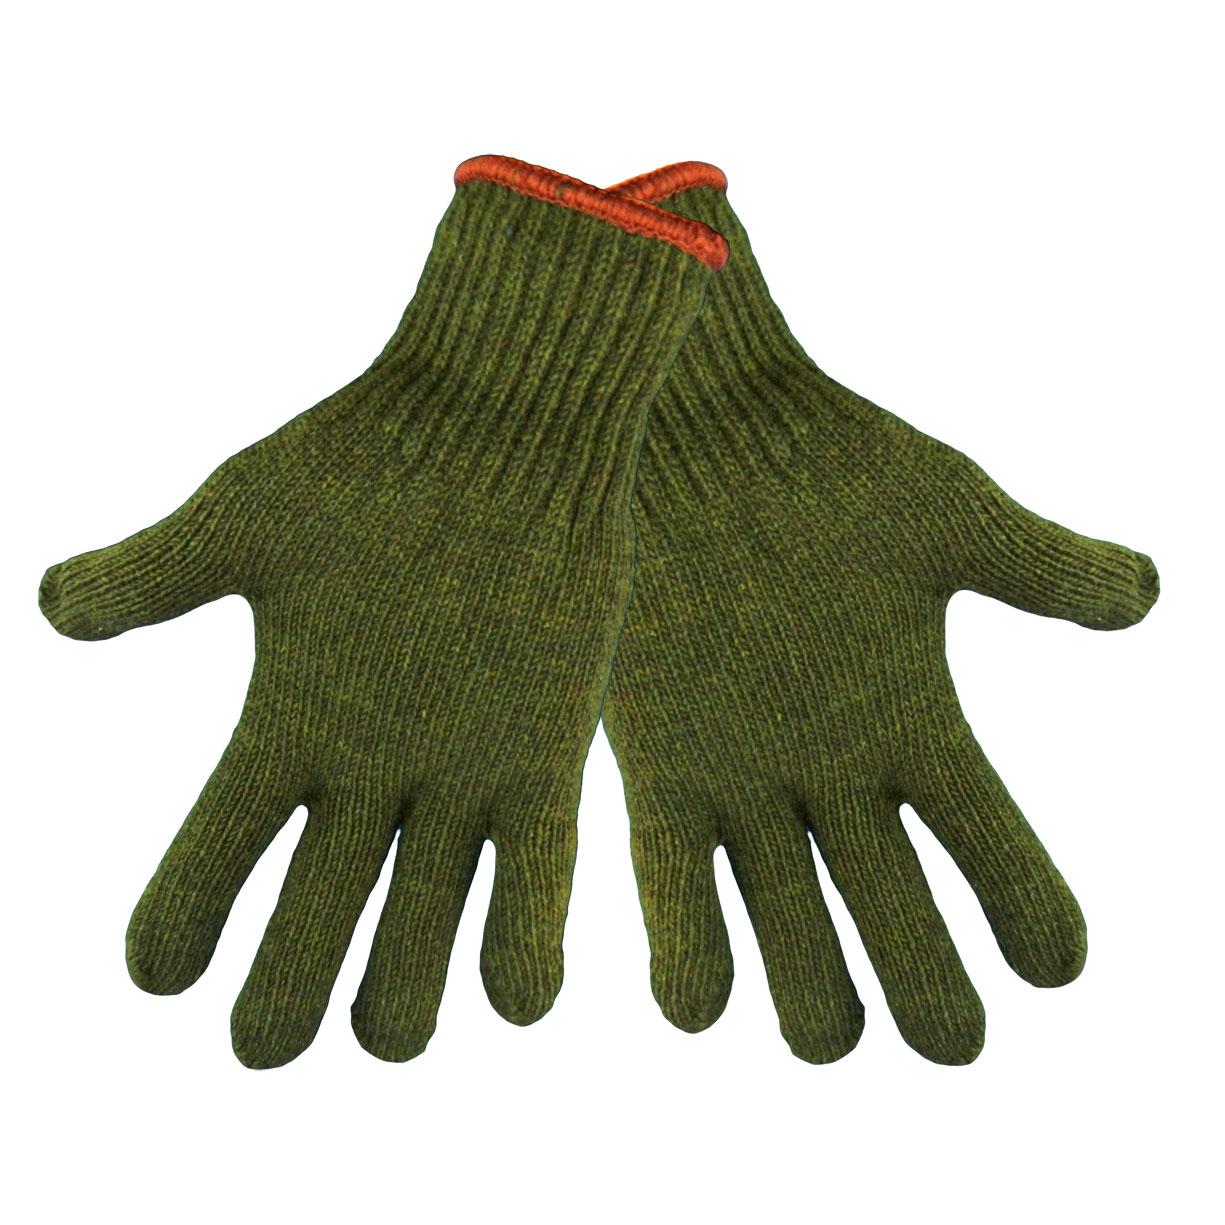 EMI Supply, Inc : Global Glove S77RW Medium Weight, Army Green, Rag Wool Gloves, Large, 12PK ...